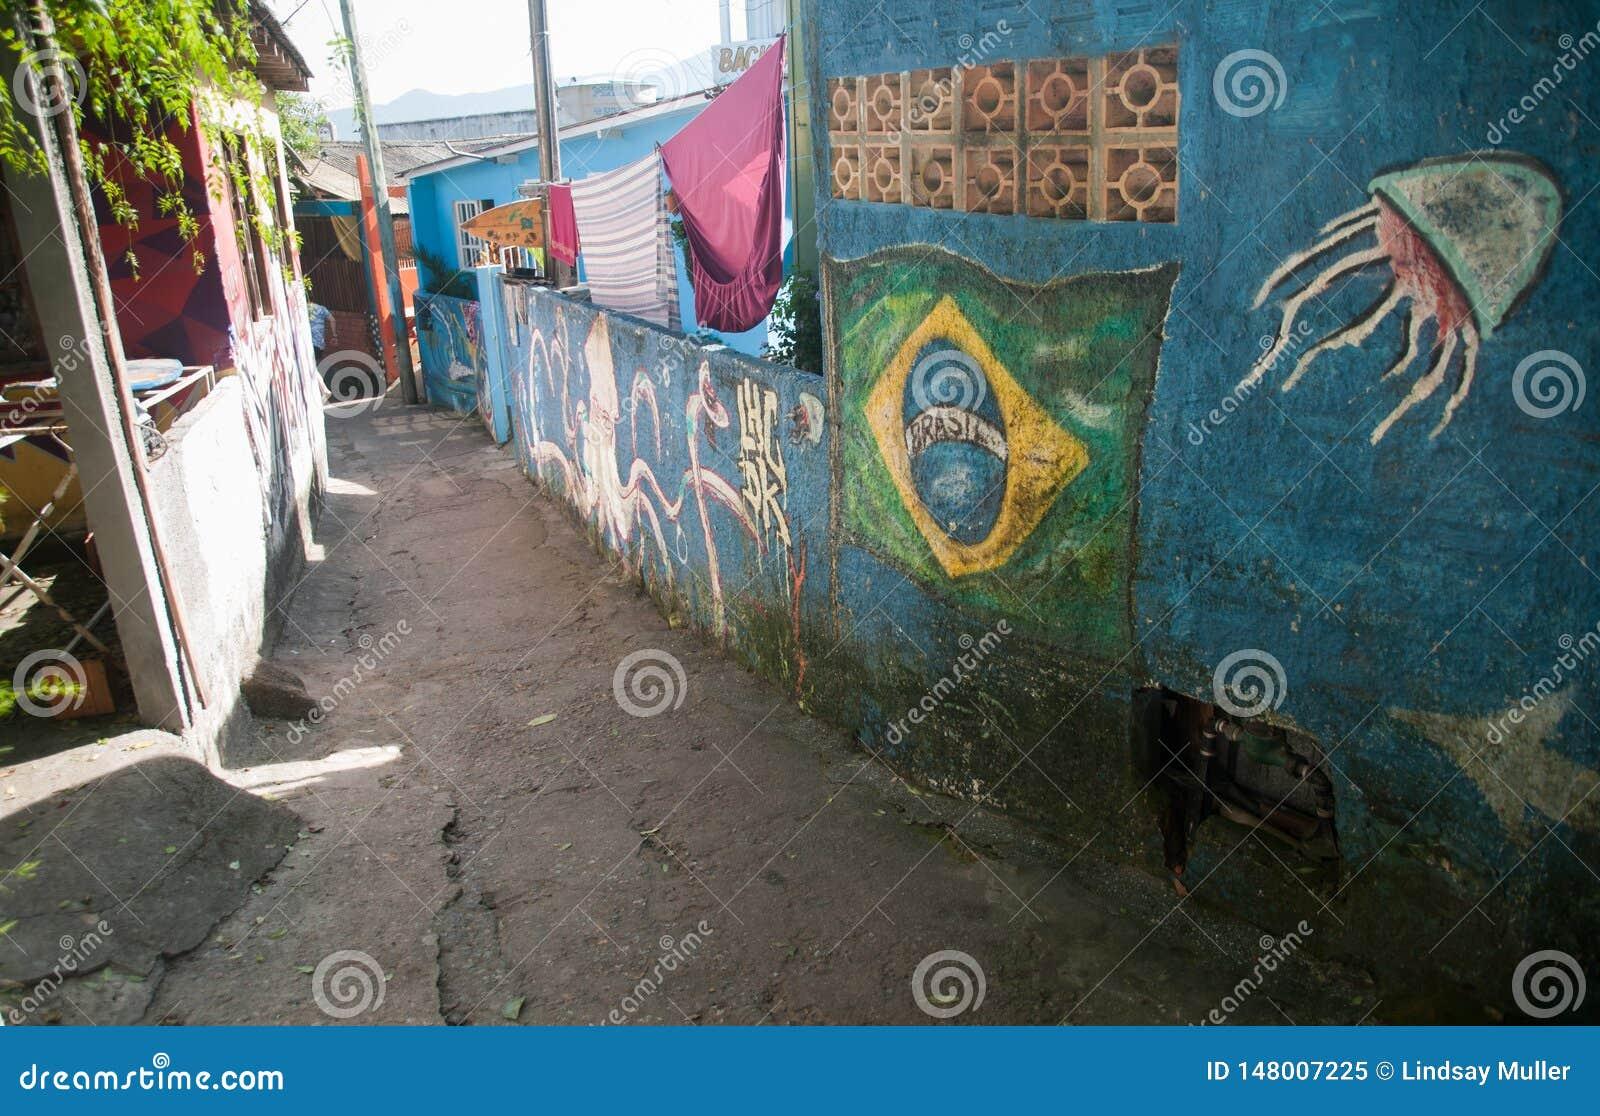 Graffiti Behandelde Steeg in Brazilië met Vlag